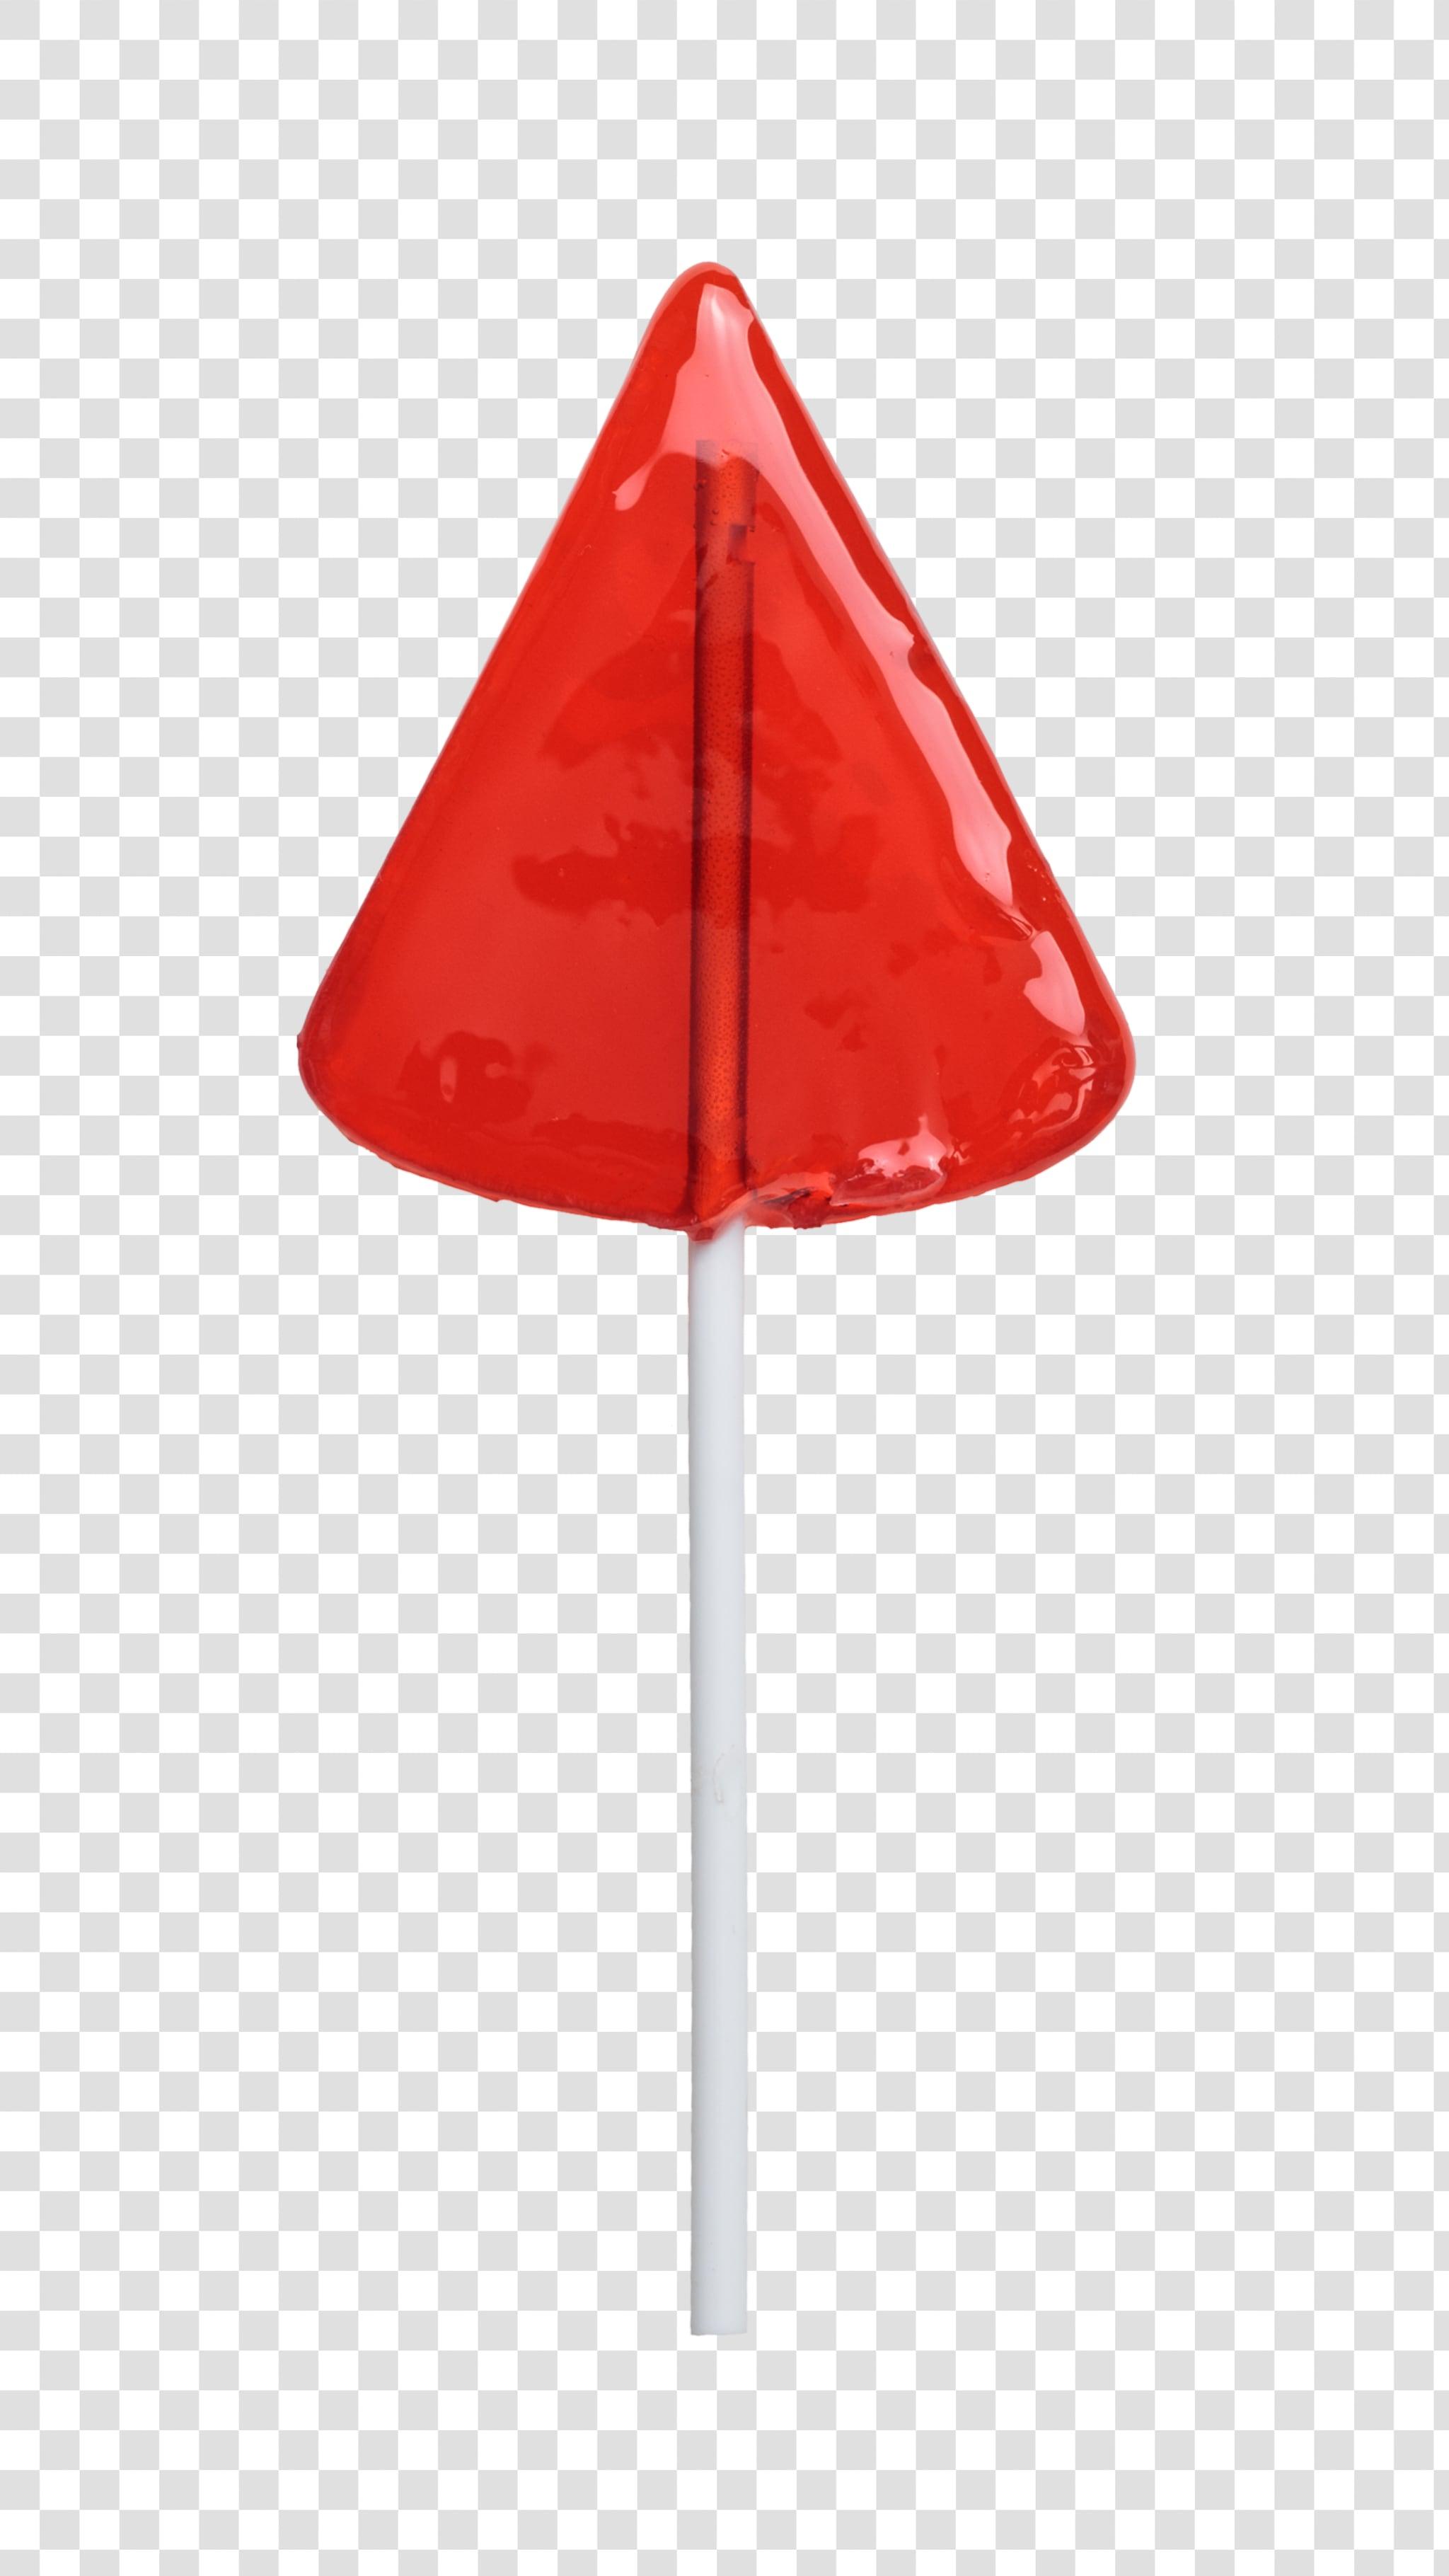 Lollipop PSD image with transparent background